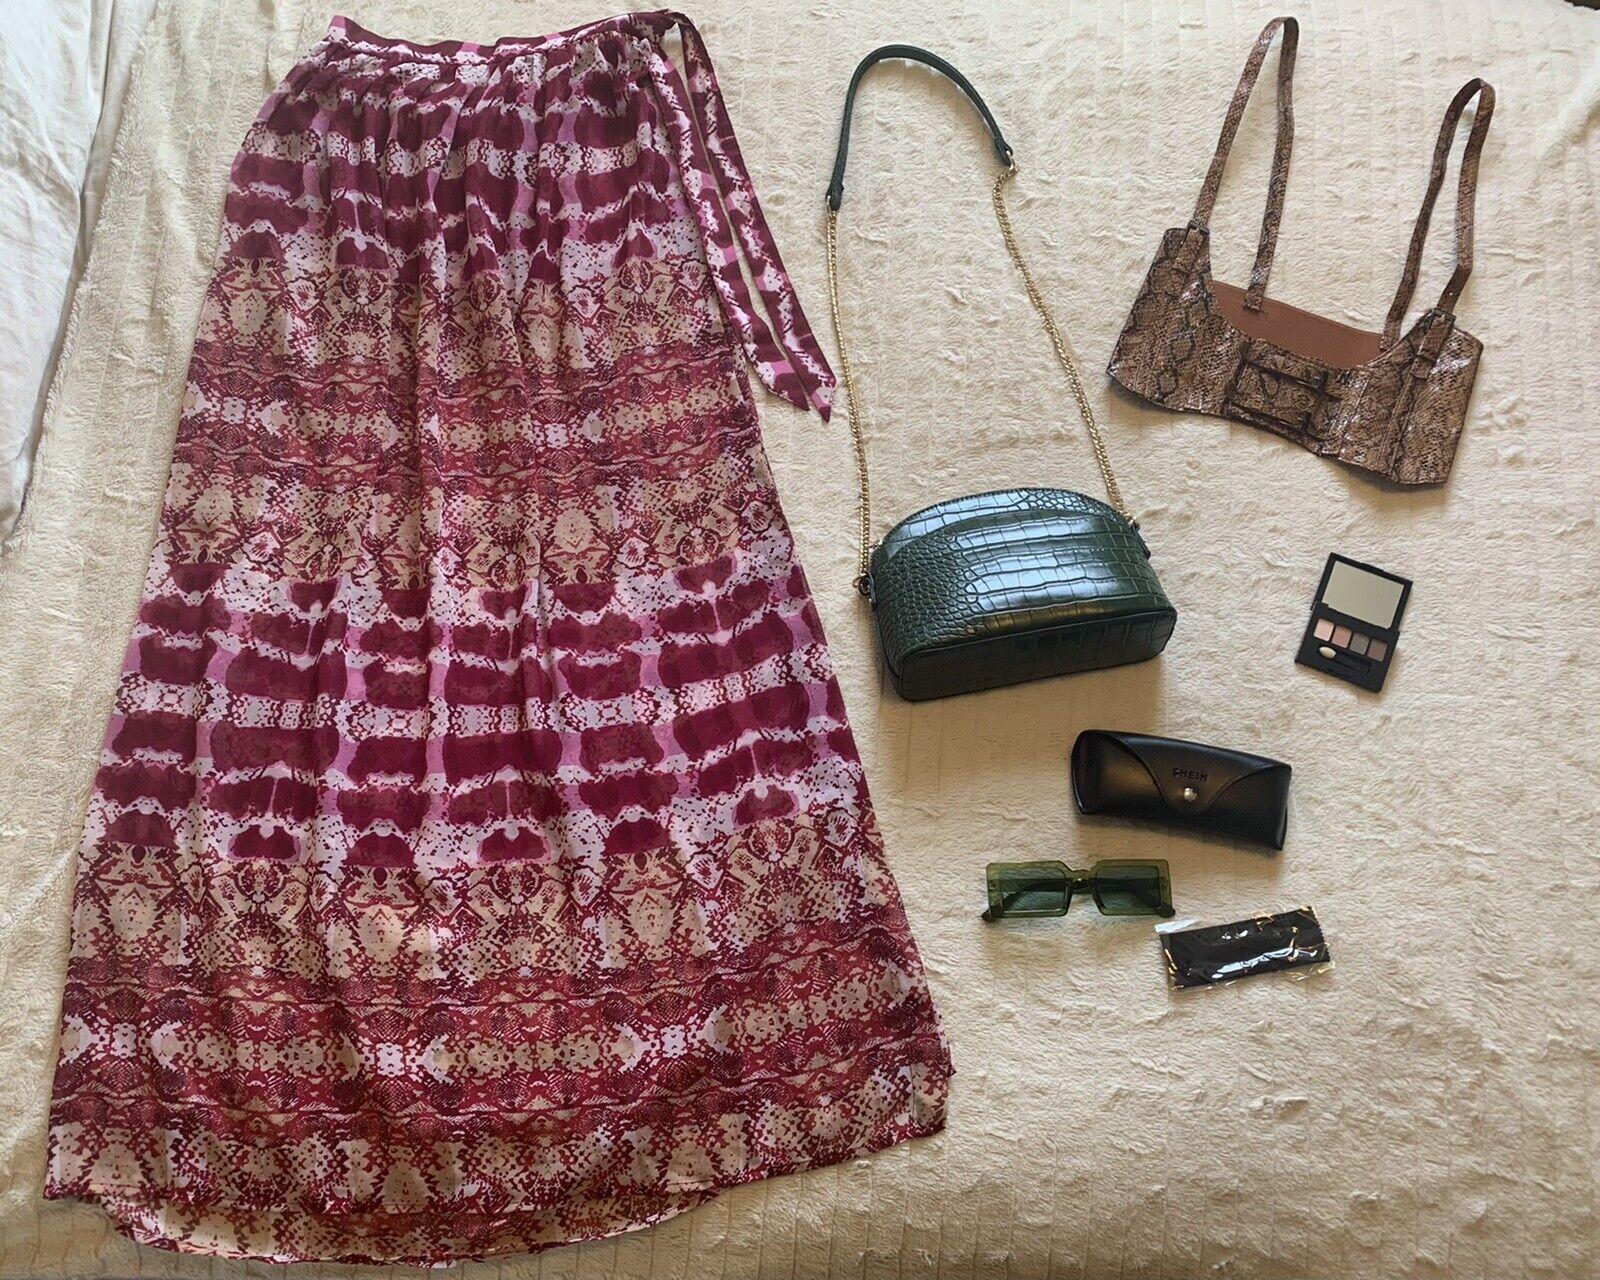 Green & Snakeskin Bundle: Bag, Sunglasses, Belt, Eye Shadow Palette & Cover Up